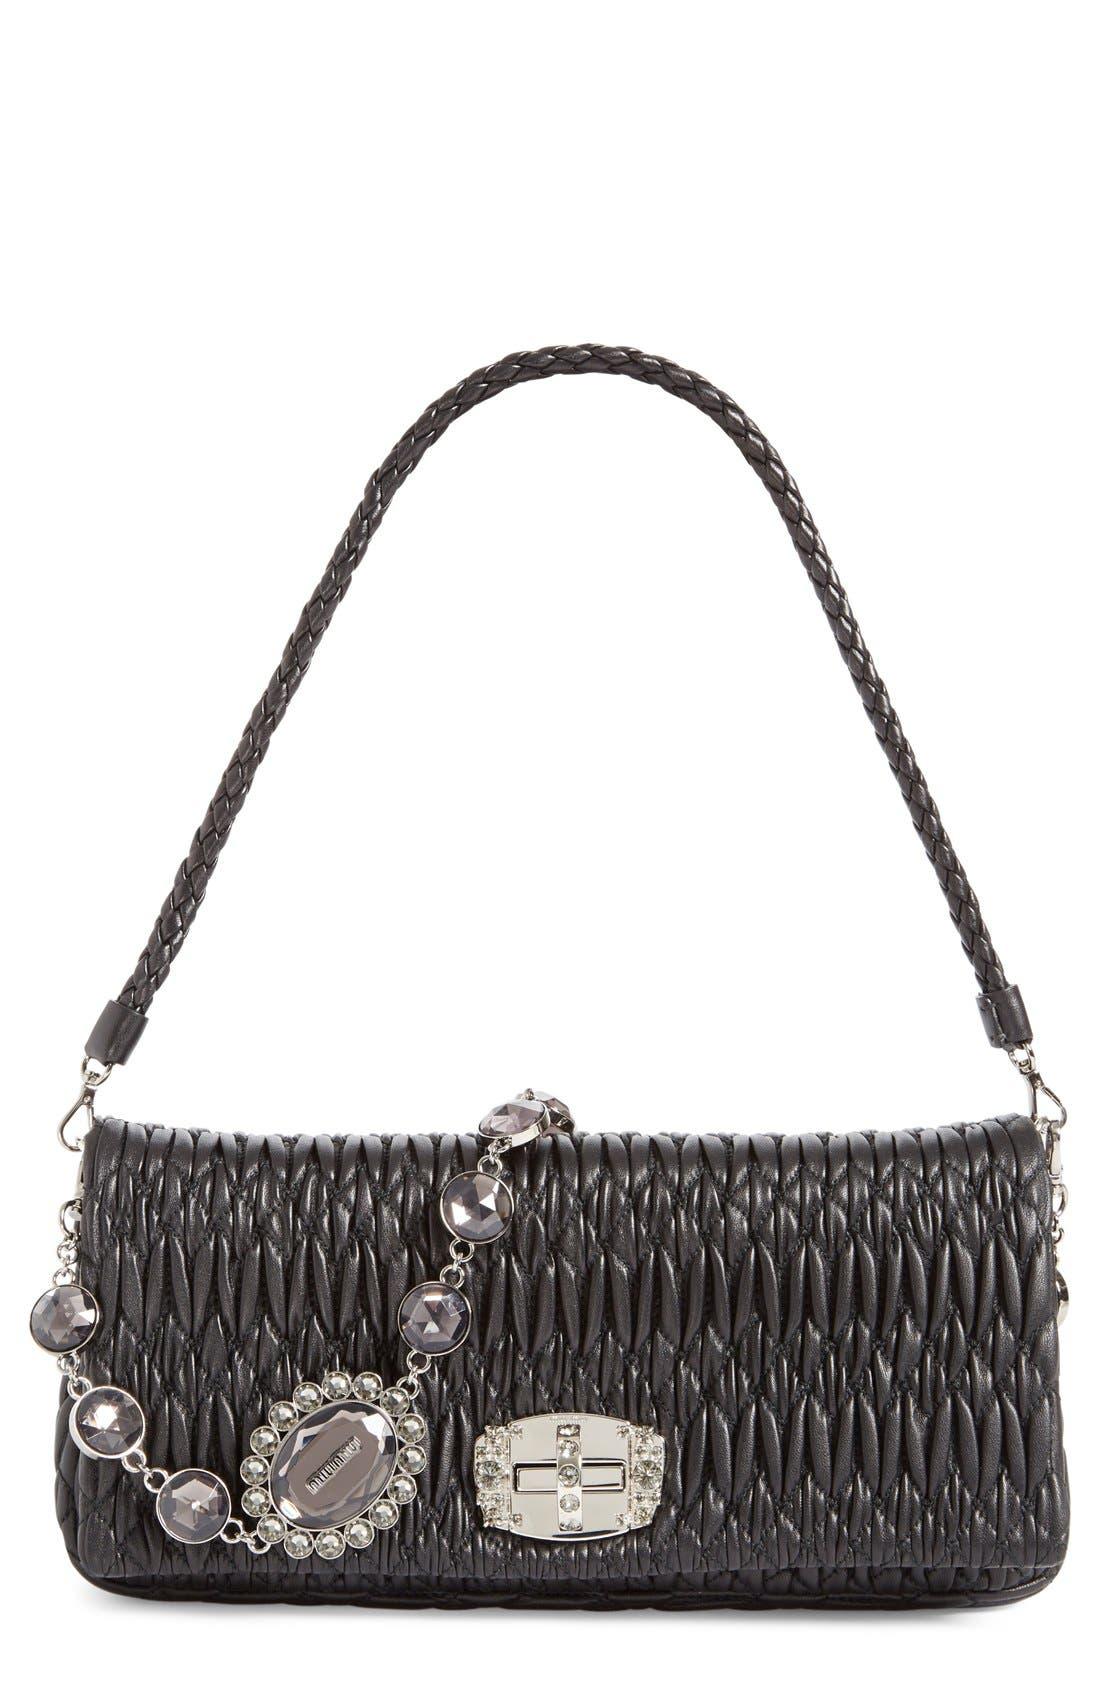 MIU MIU Medium Swarovski Crystal Chain Leather Shoulder